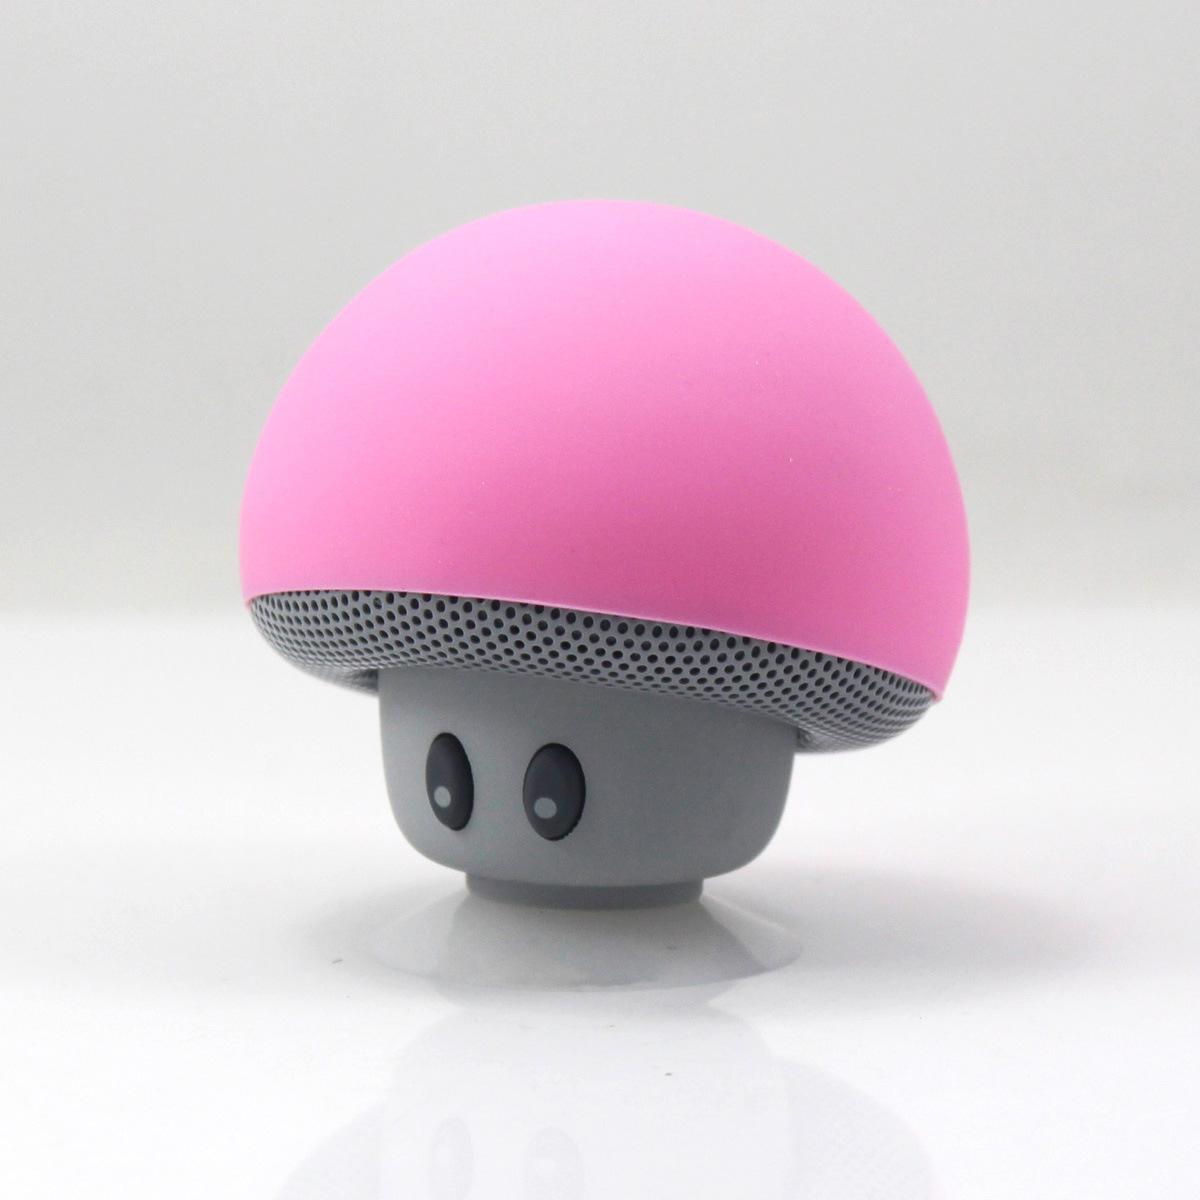 musikplayer speaker tragbare lautsprecher elektronik. Black Bedroom Furniture Sets. Home Design Ideas